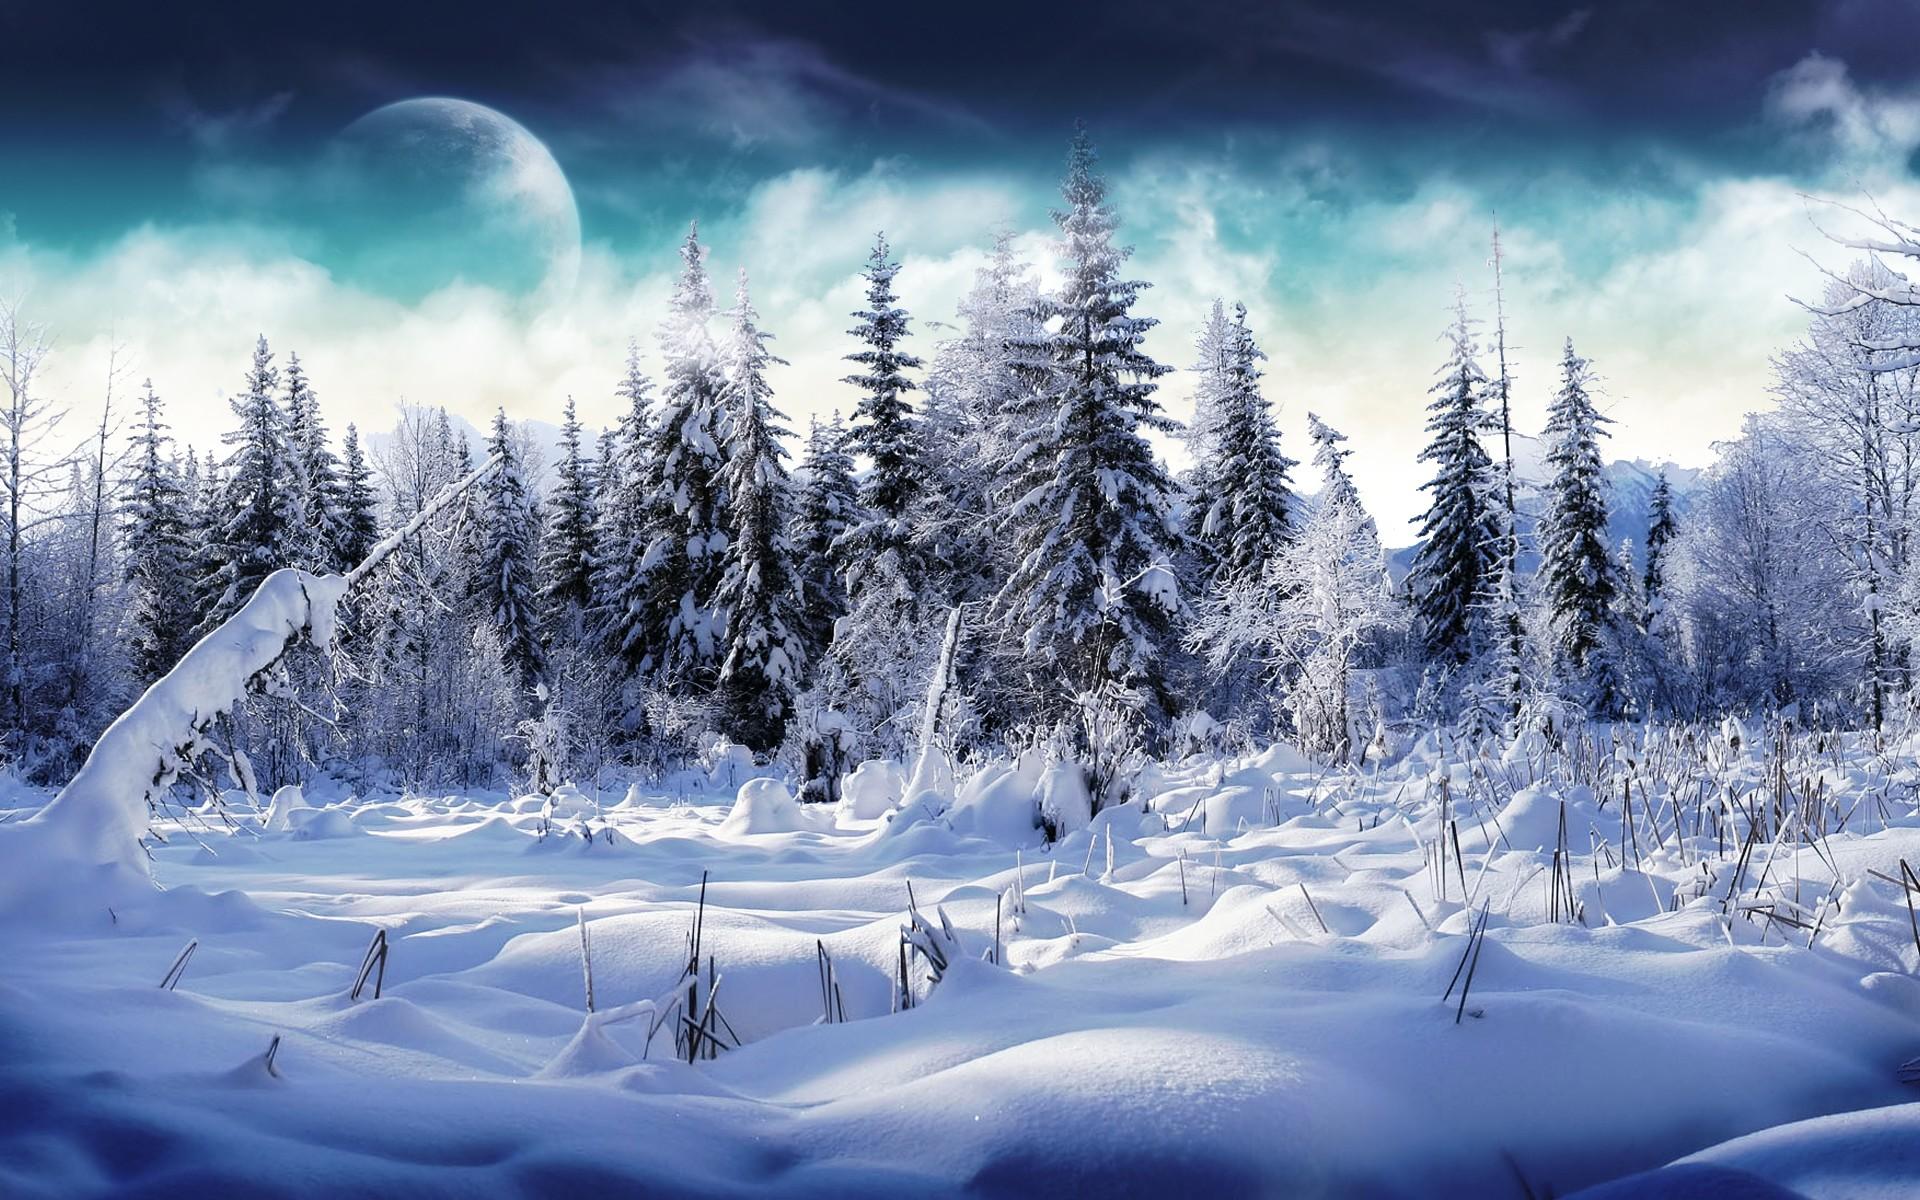 best winter wallpapers best winter wallpapers best winter wallpapers 1920x1200